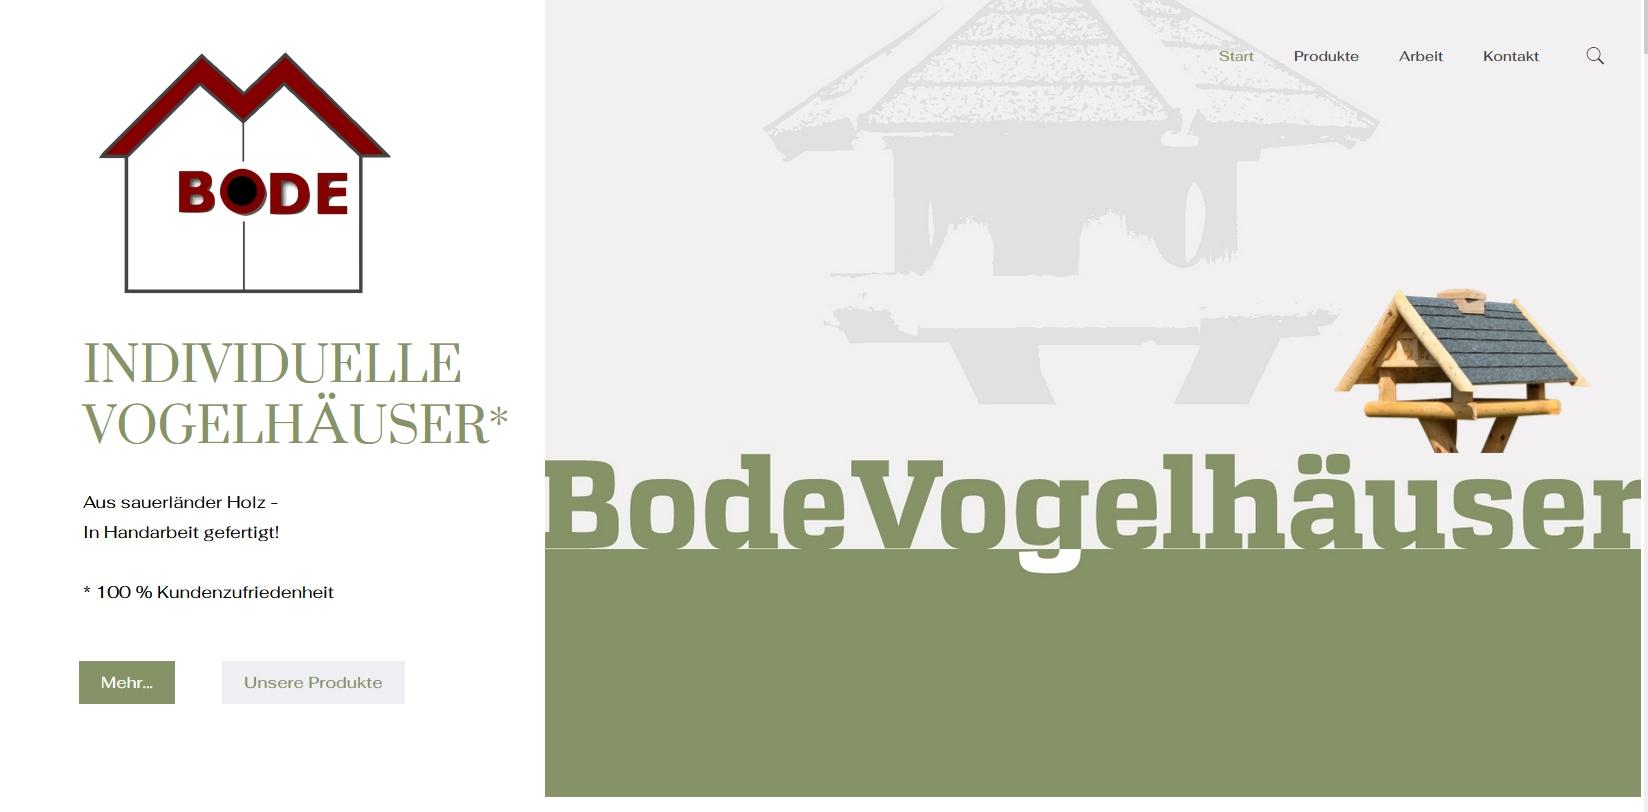 A24-data Projekt Vogelhäuser Bode